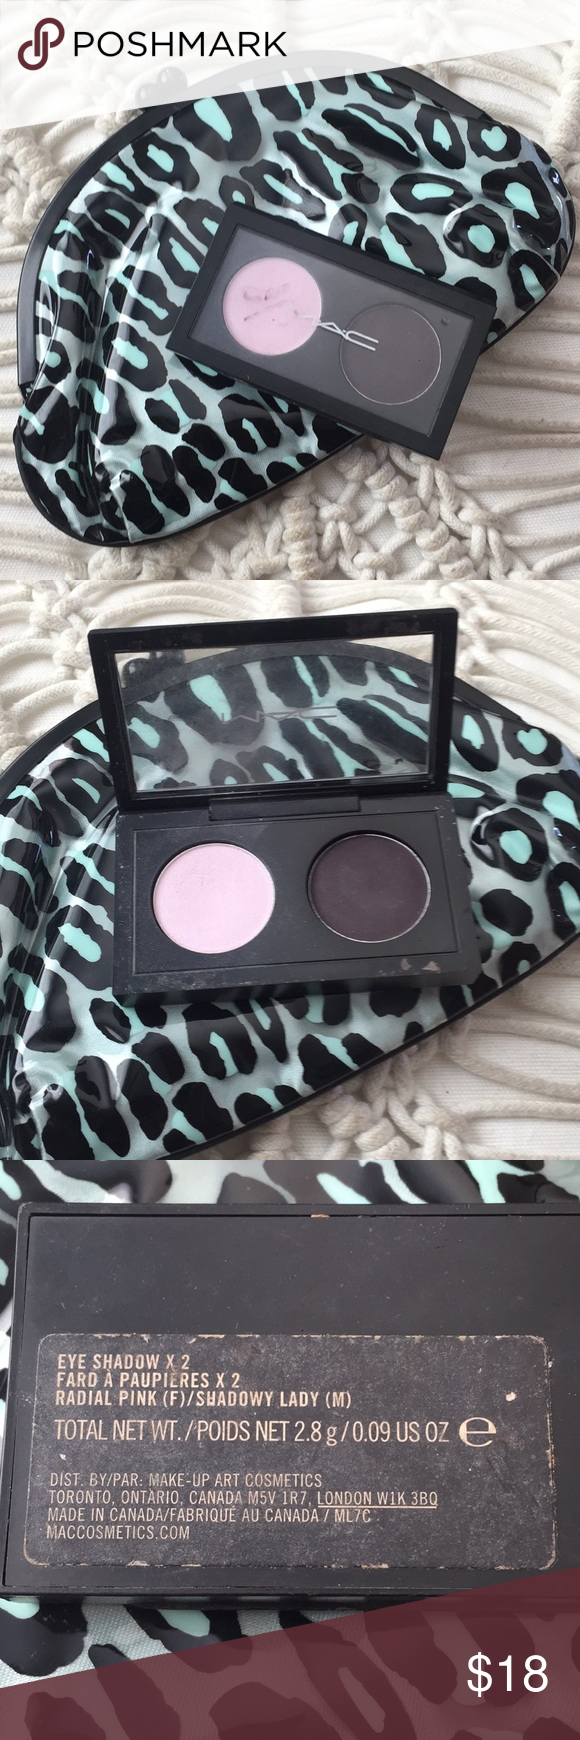 MAC Cosmetics Eyeshadow and Clutch Slightly used mini